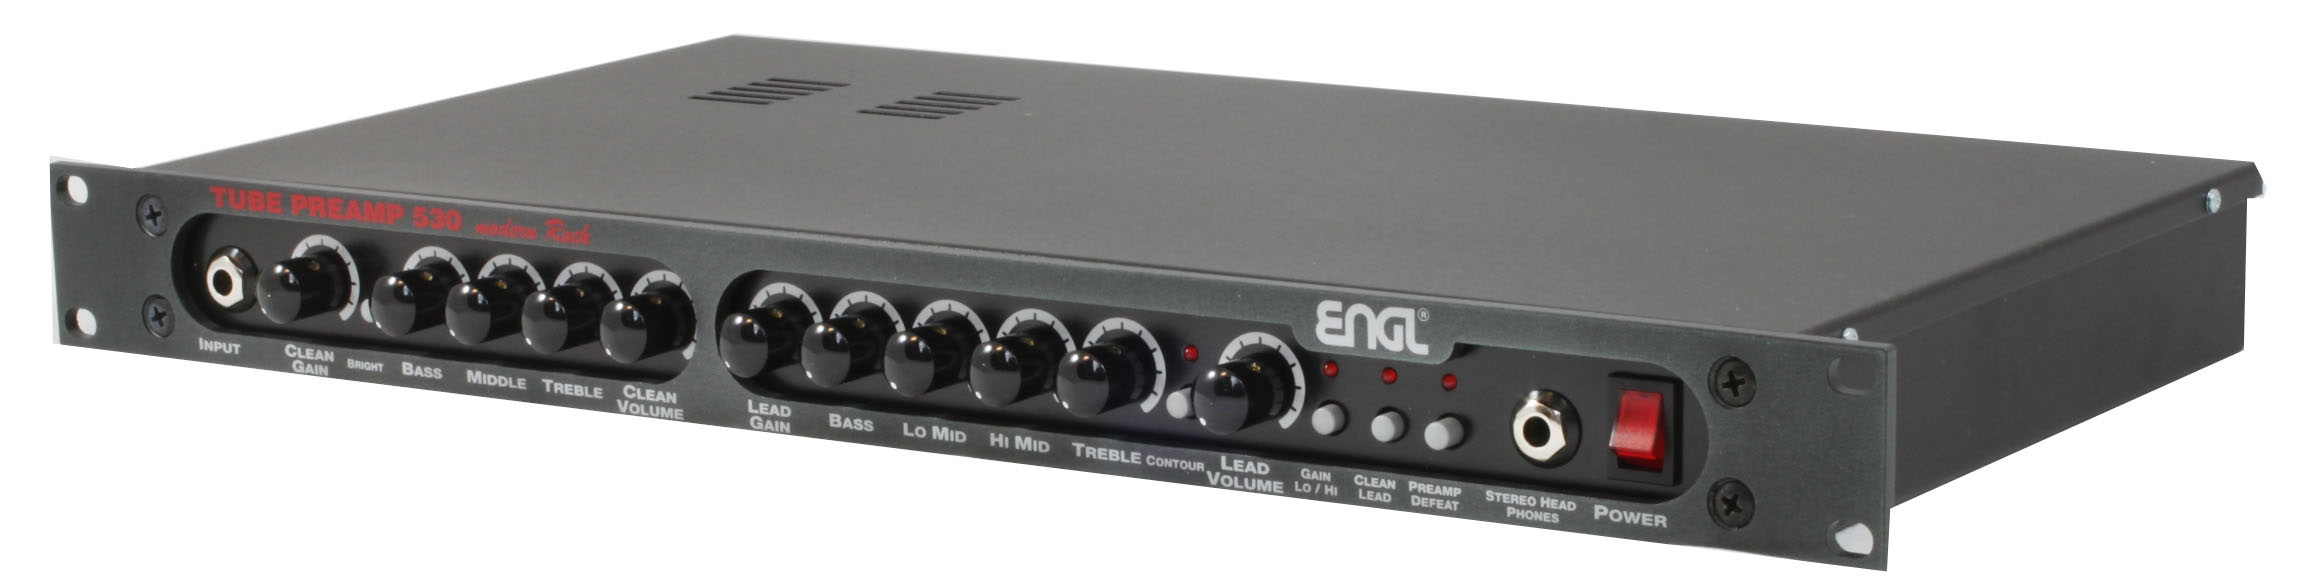 Engl Tube Preamp E530